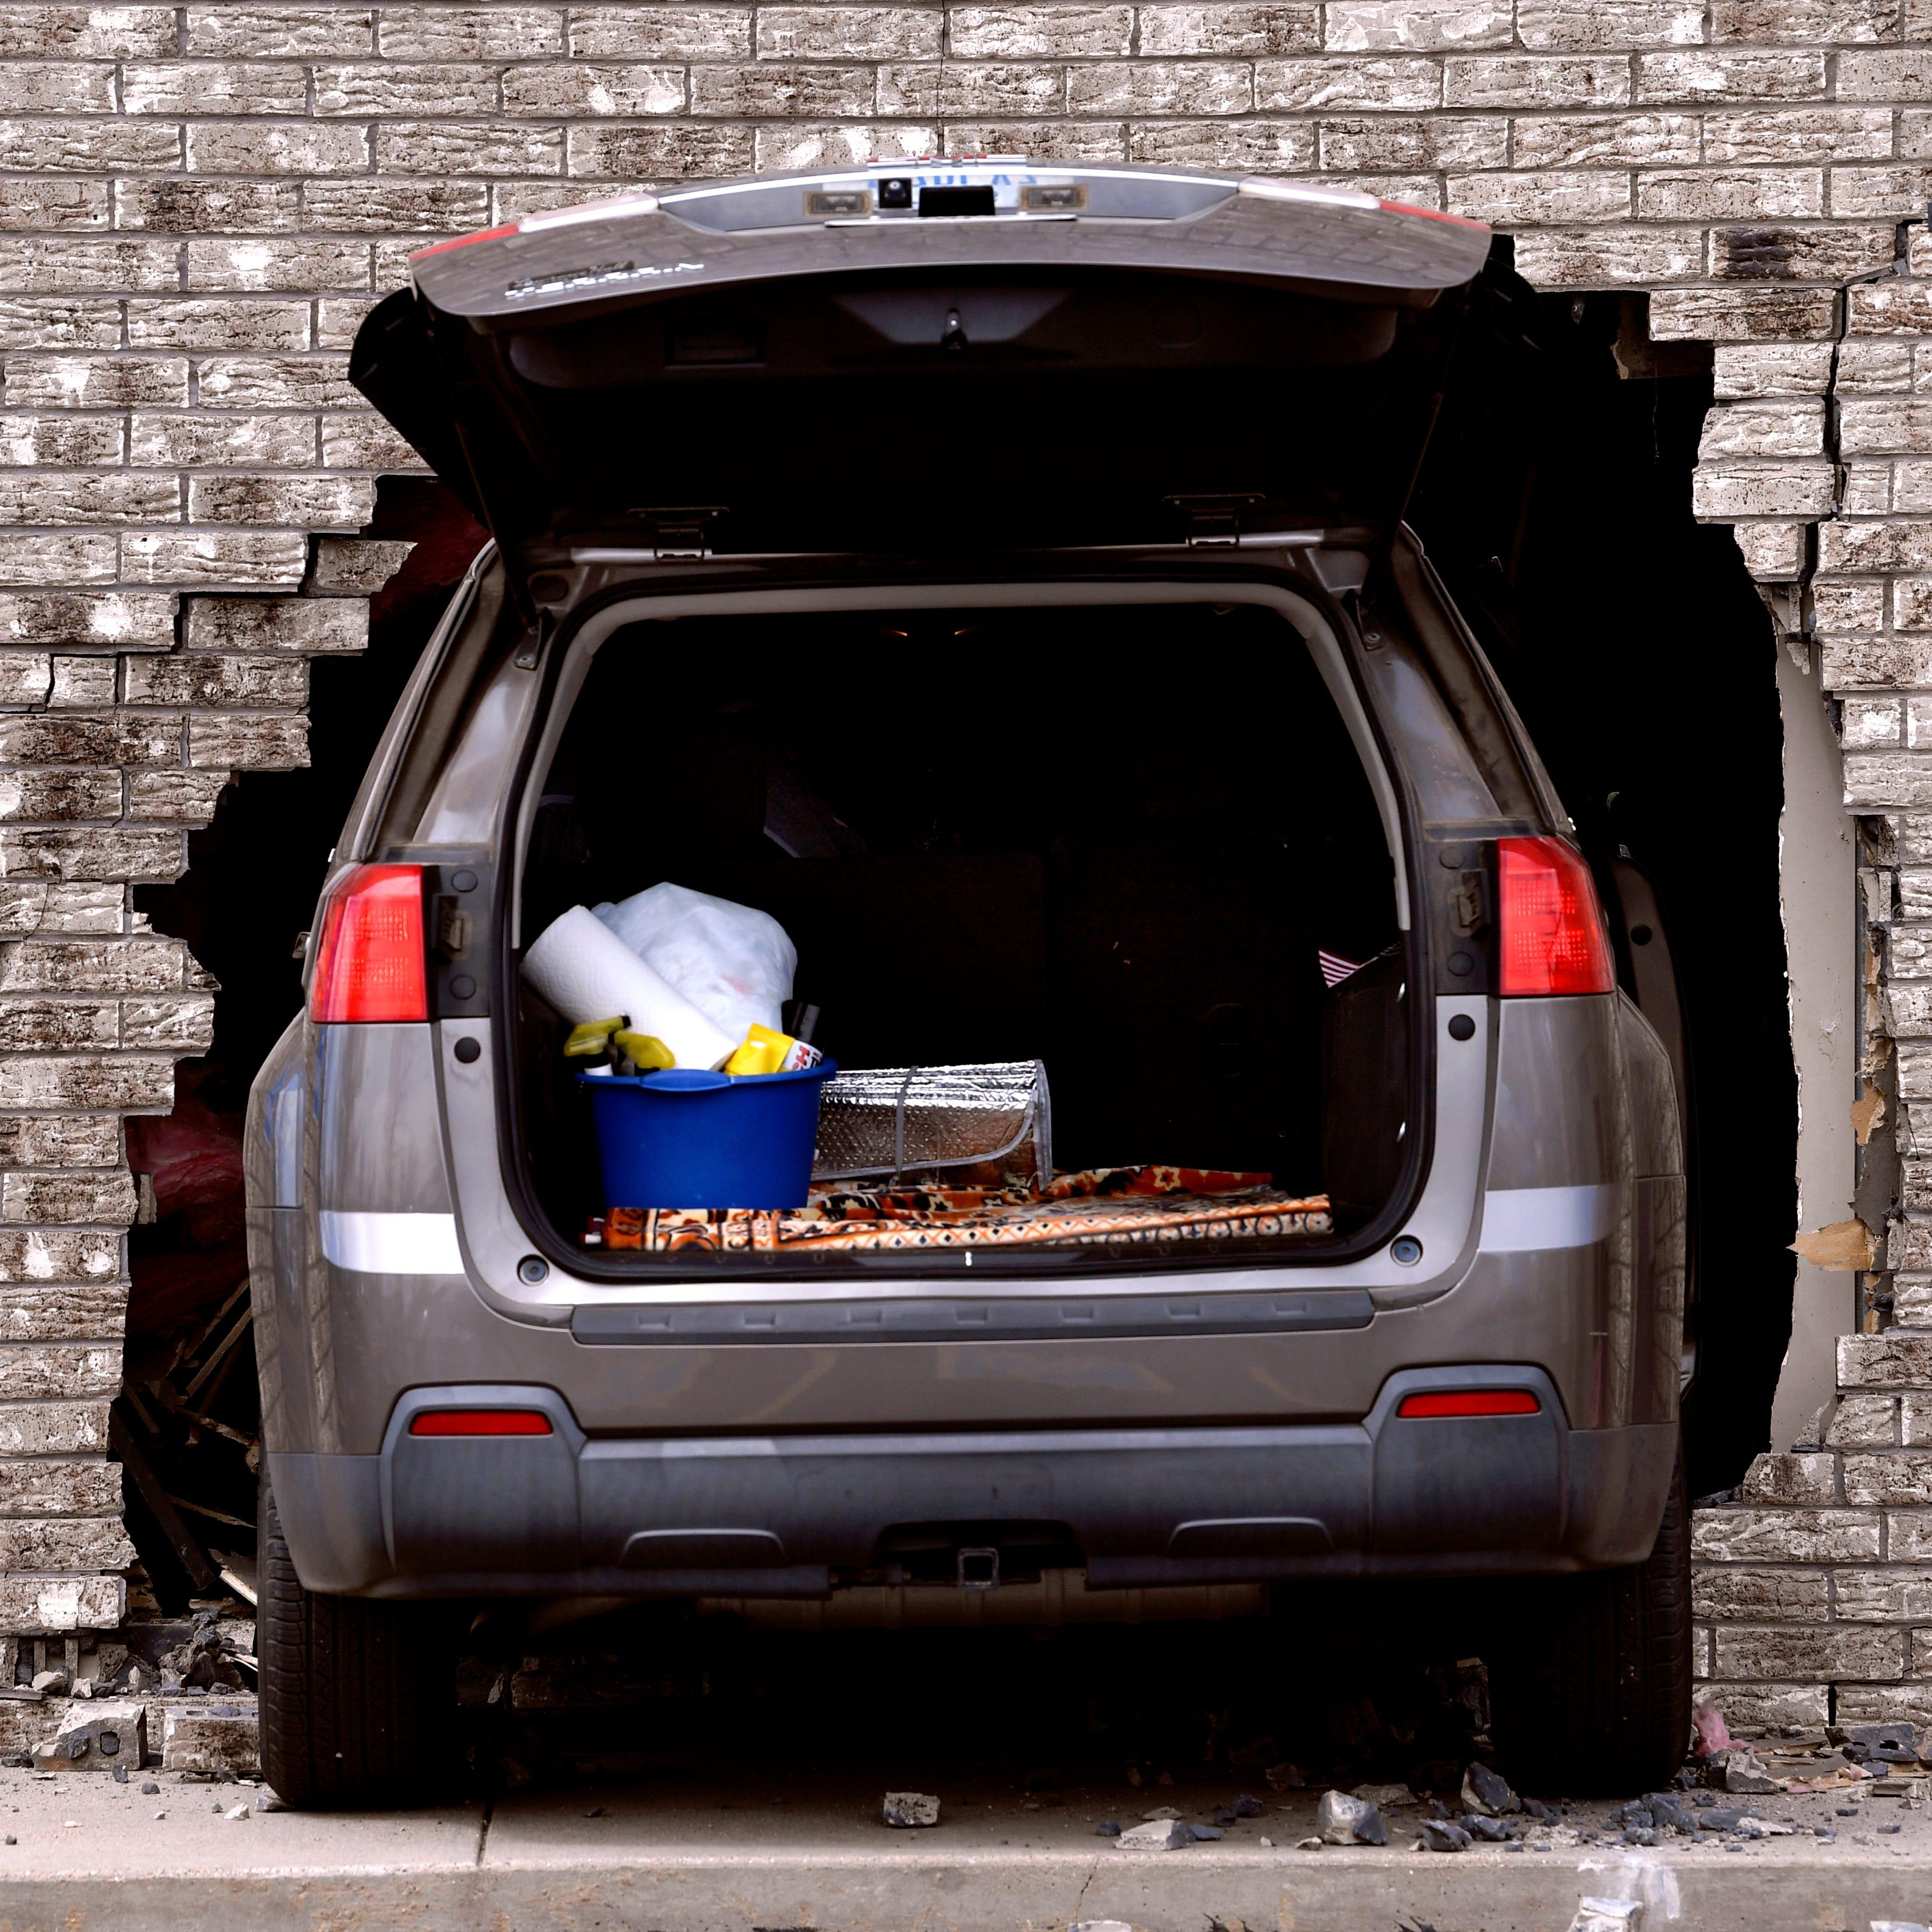 Car strikes VFW building in Abilene